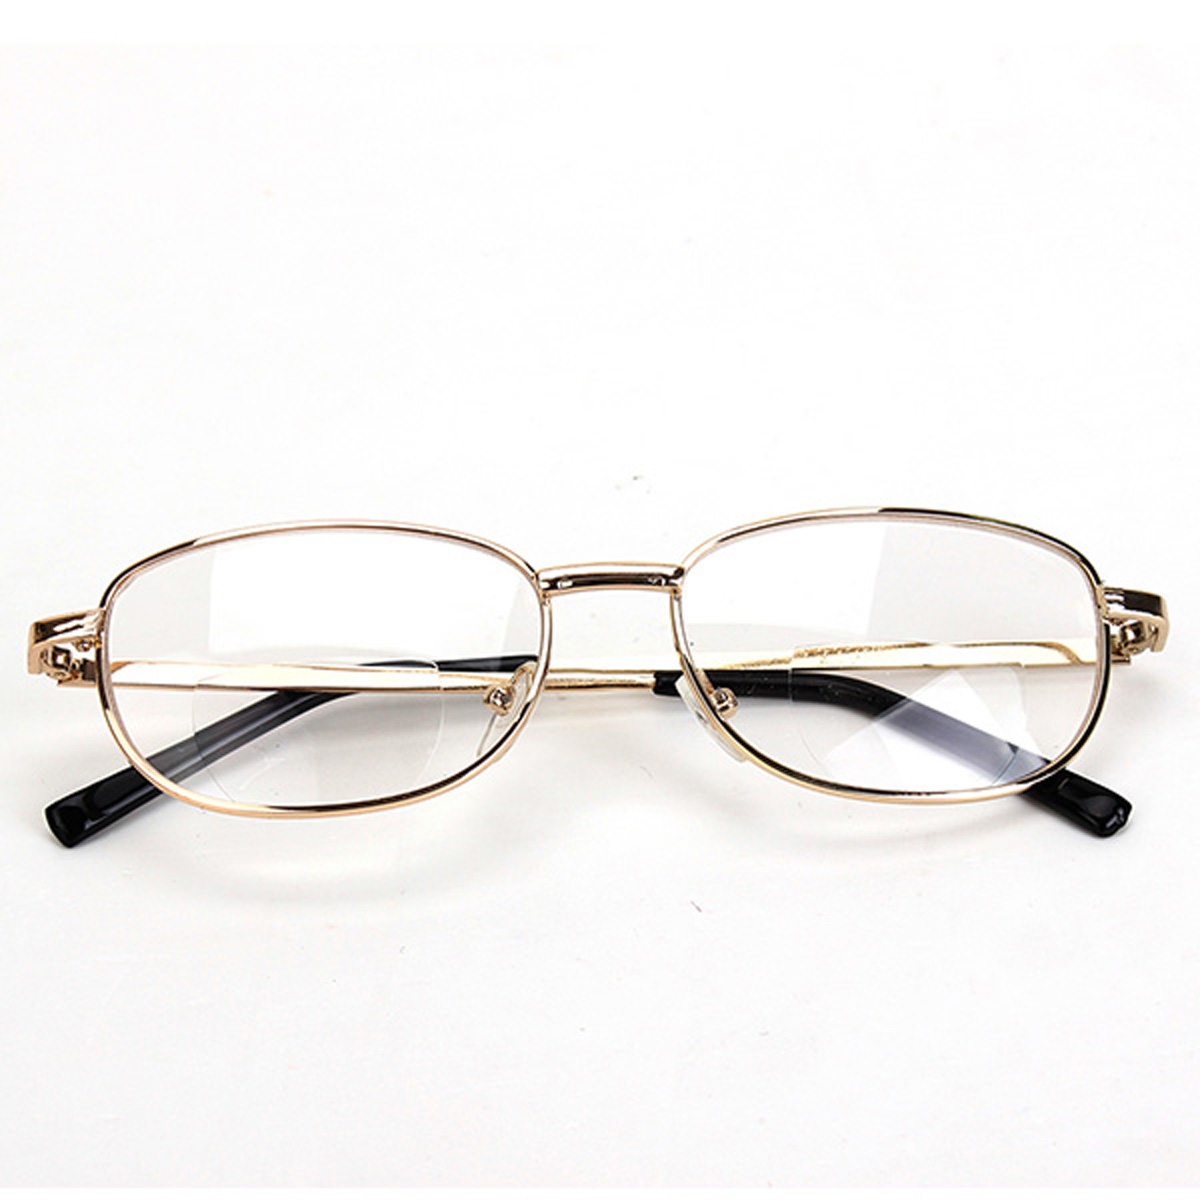 fashion bifocal lens rimmed s reading glasses gold